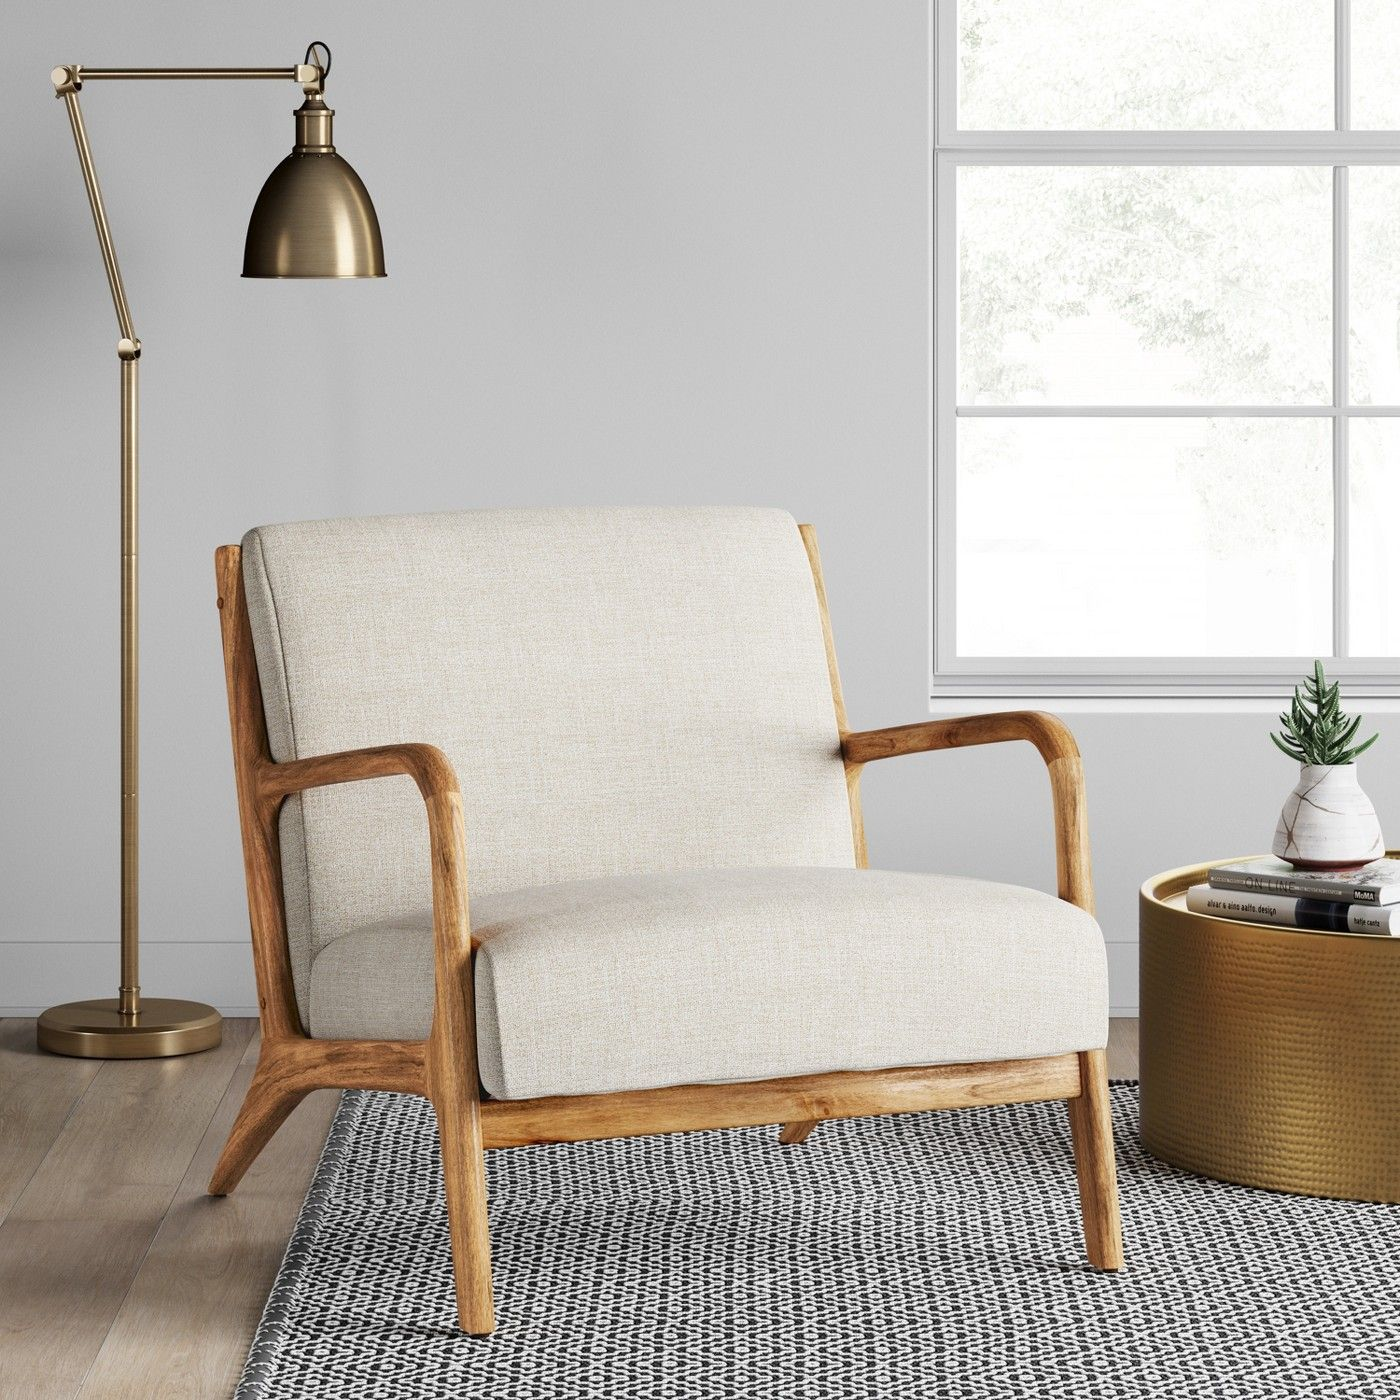 Park Art|My WordPress Blog_Esters Wood Arm Chair Project 62tm